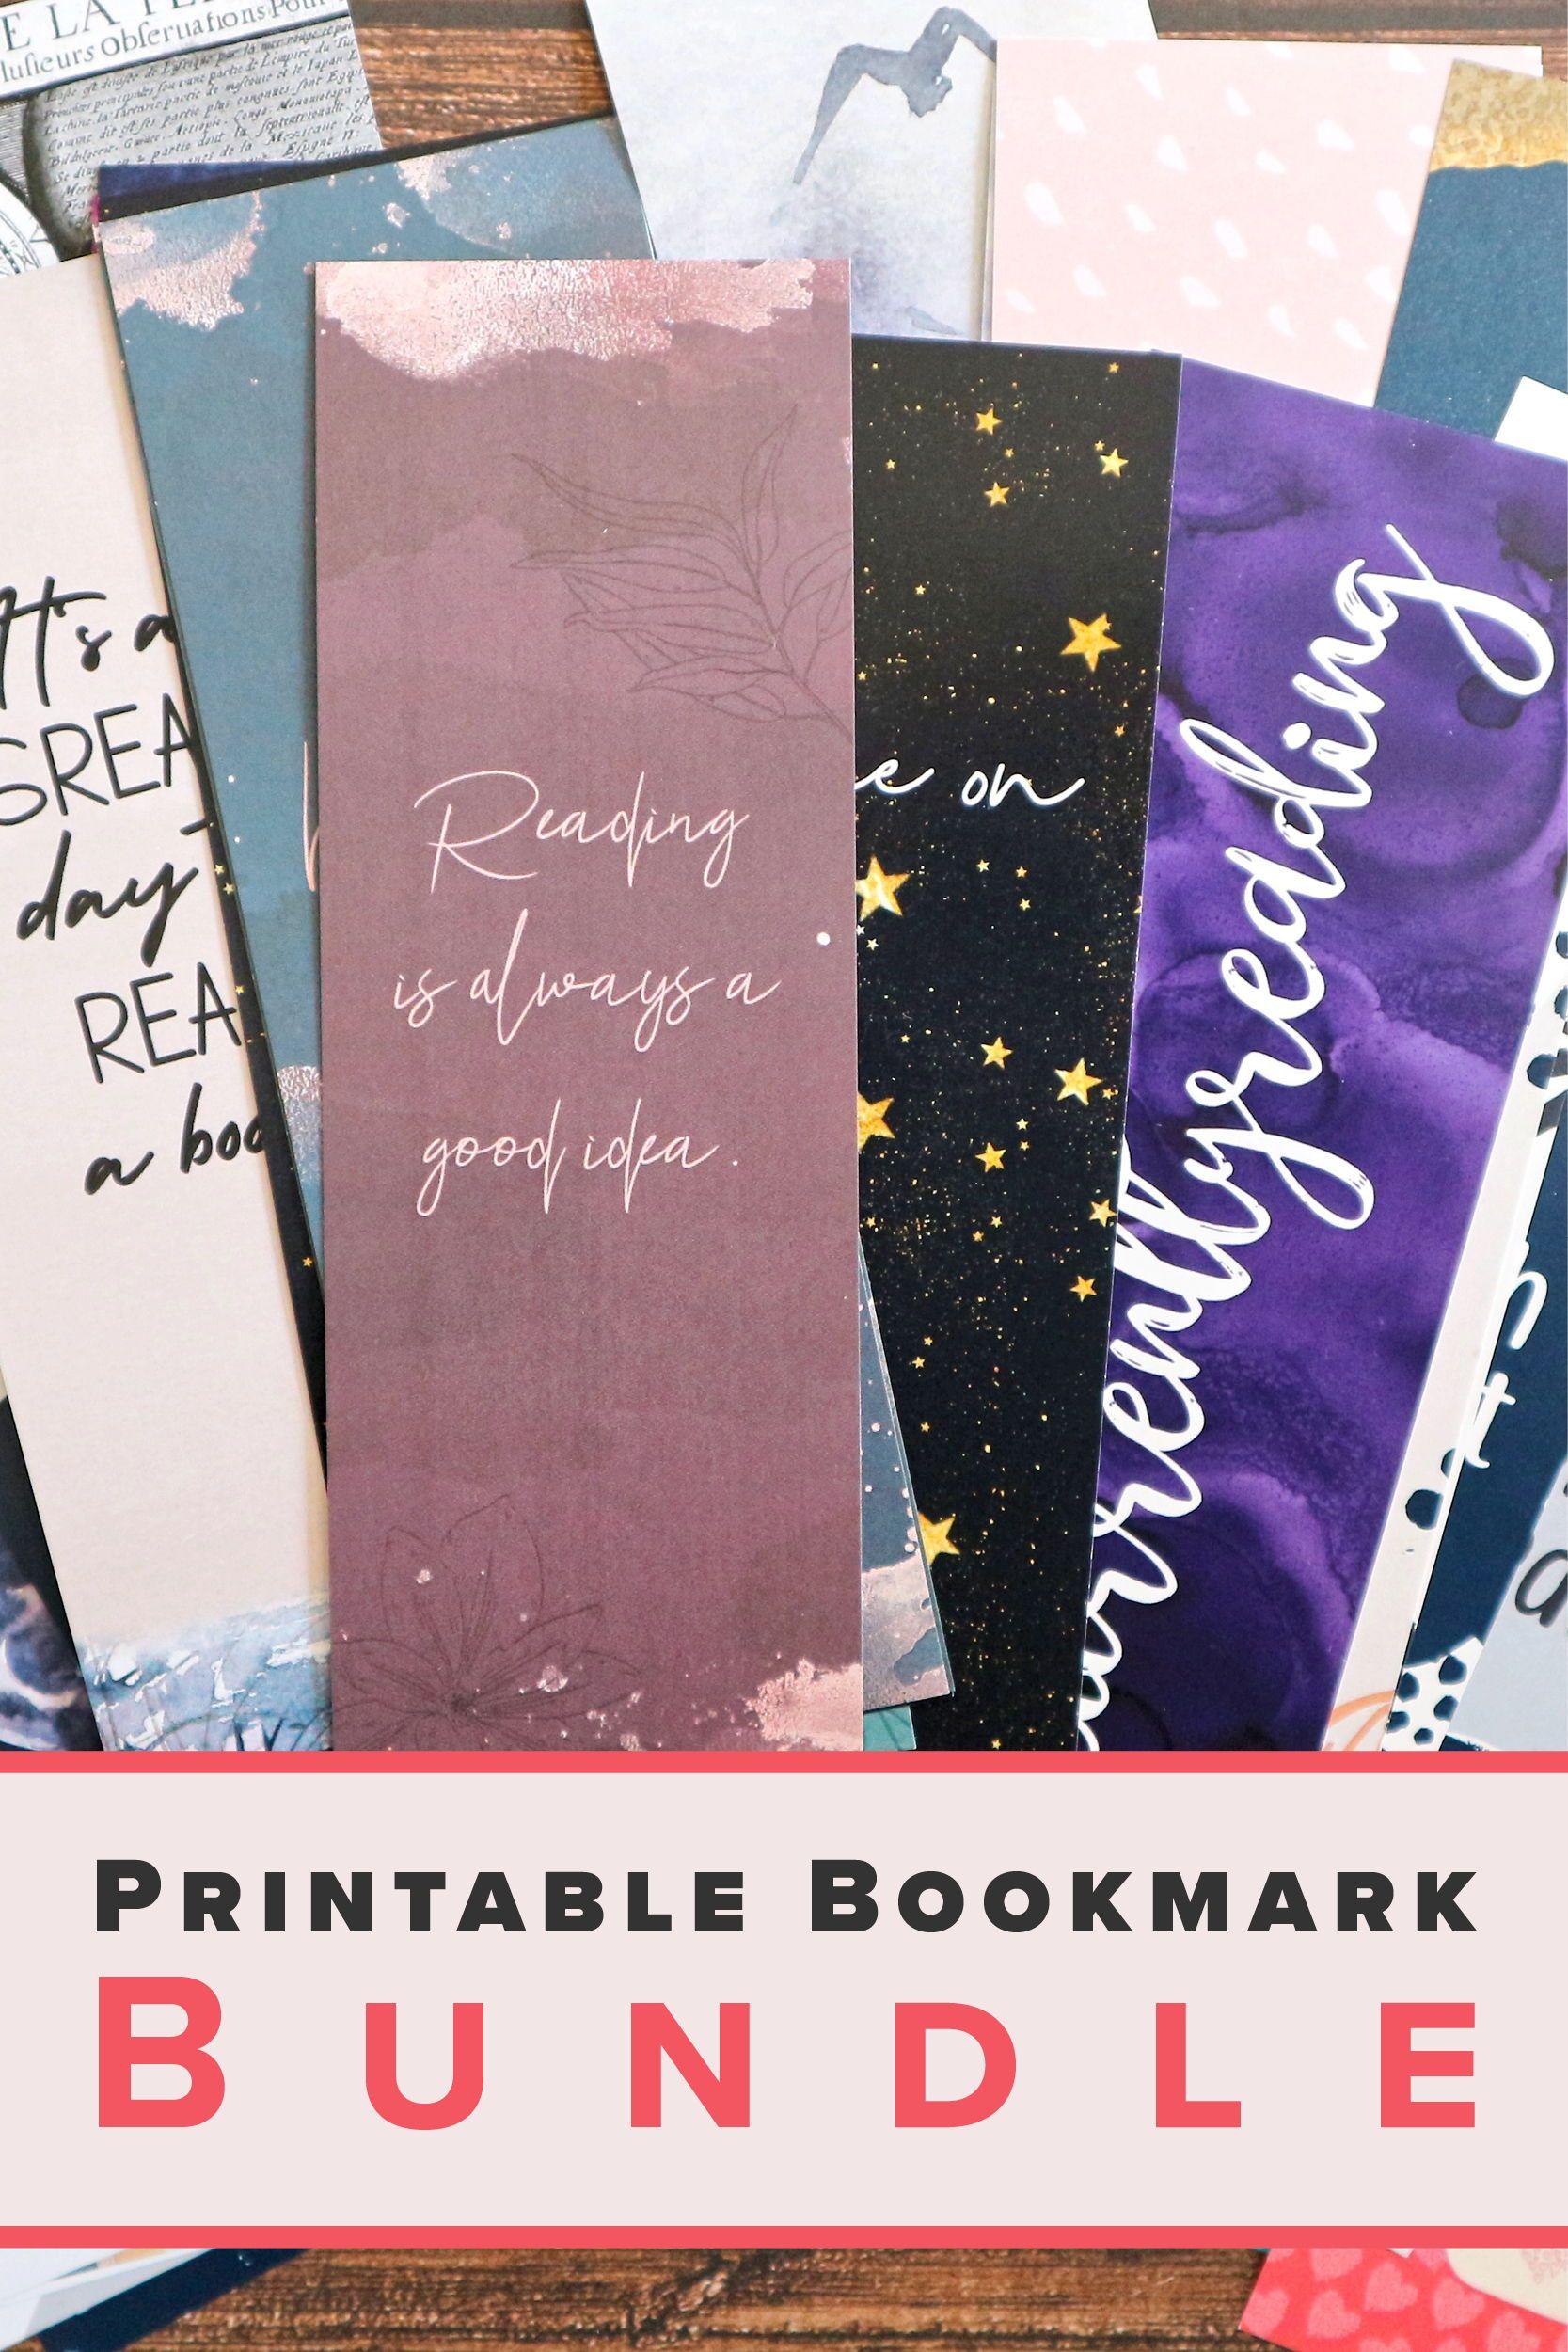 Printable Bookmark Bundle Book Club Gifts Quotes Bookmarks For Etsy Bookmarks Printable Bookclub Gifts Bookmarks For Books